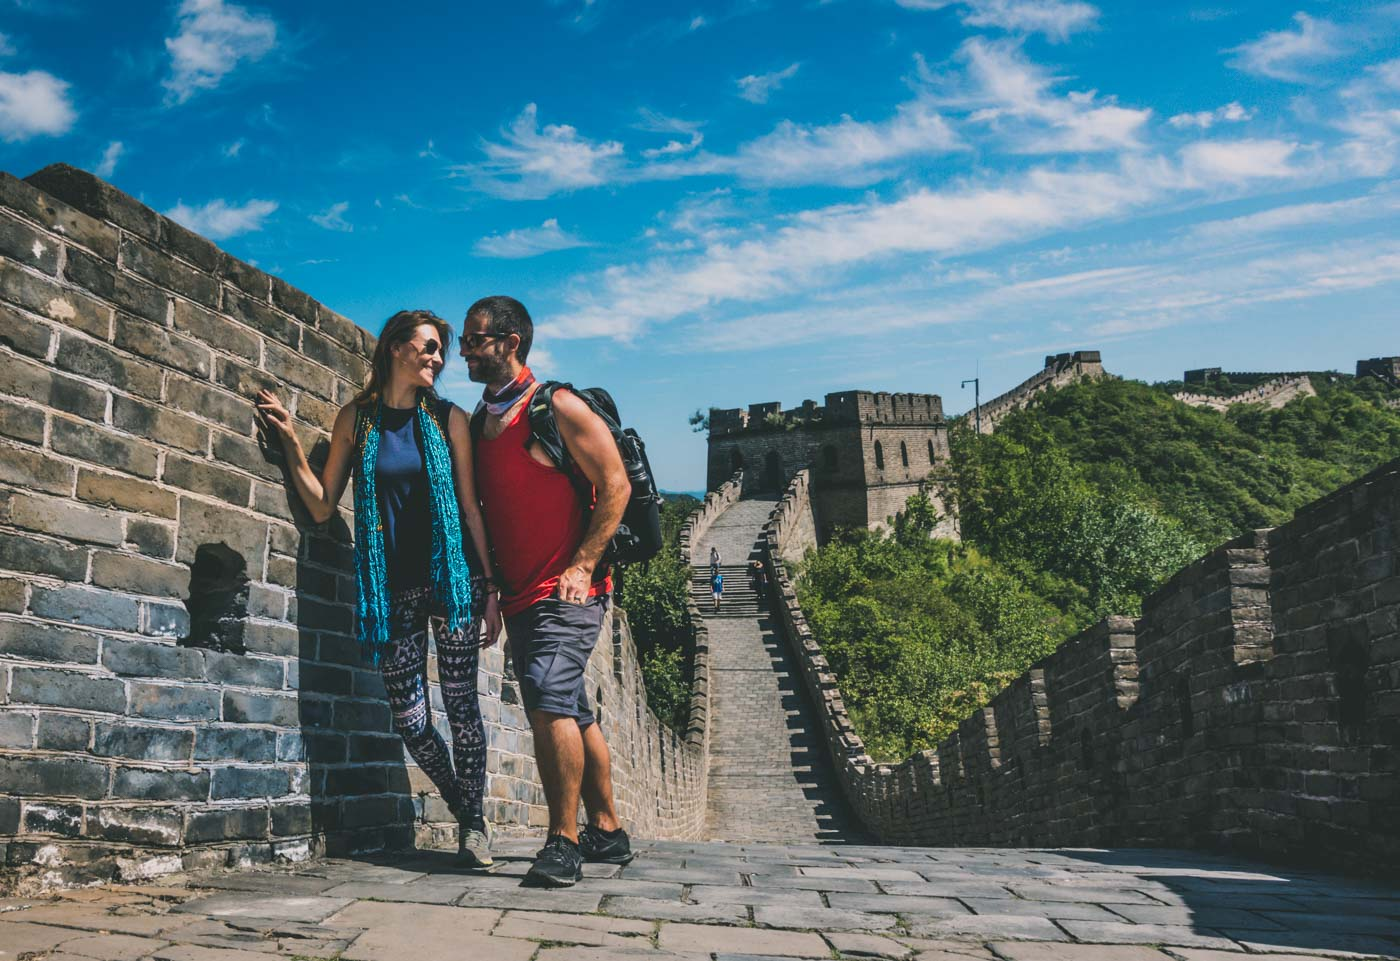 Oksana & Max hiking on the Great Wall of China, bucket list ideas